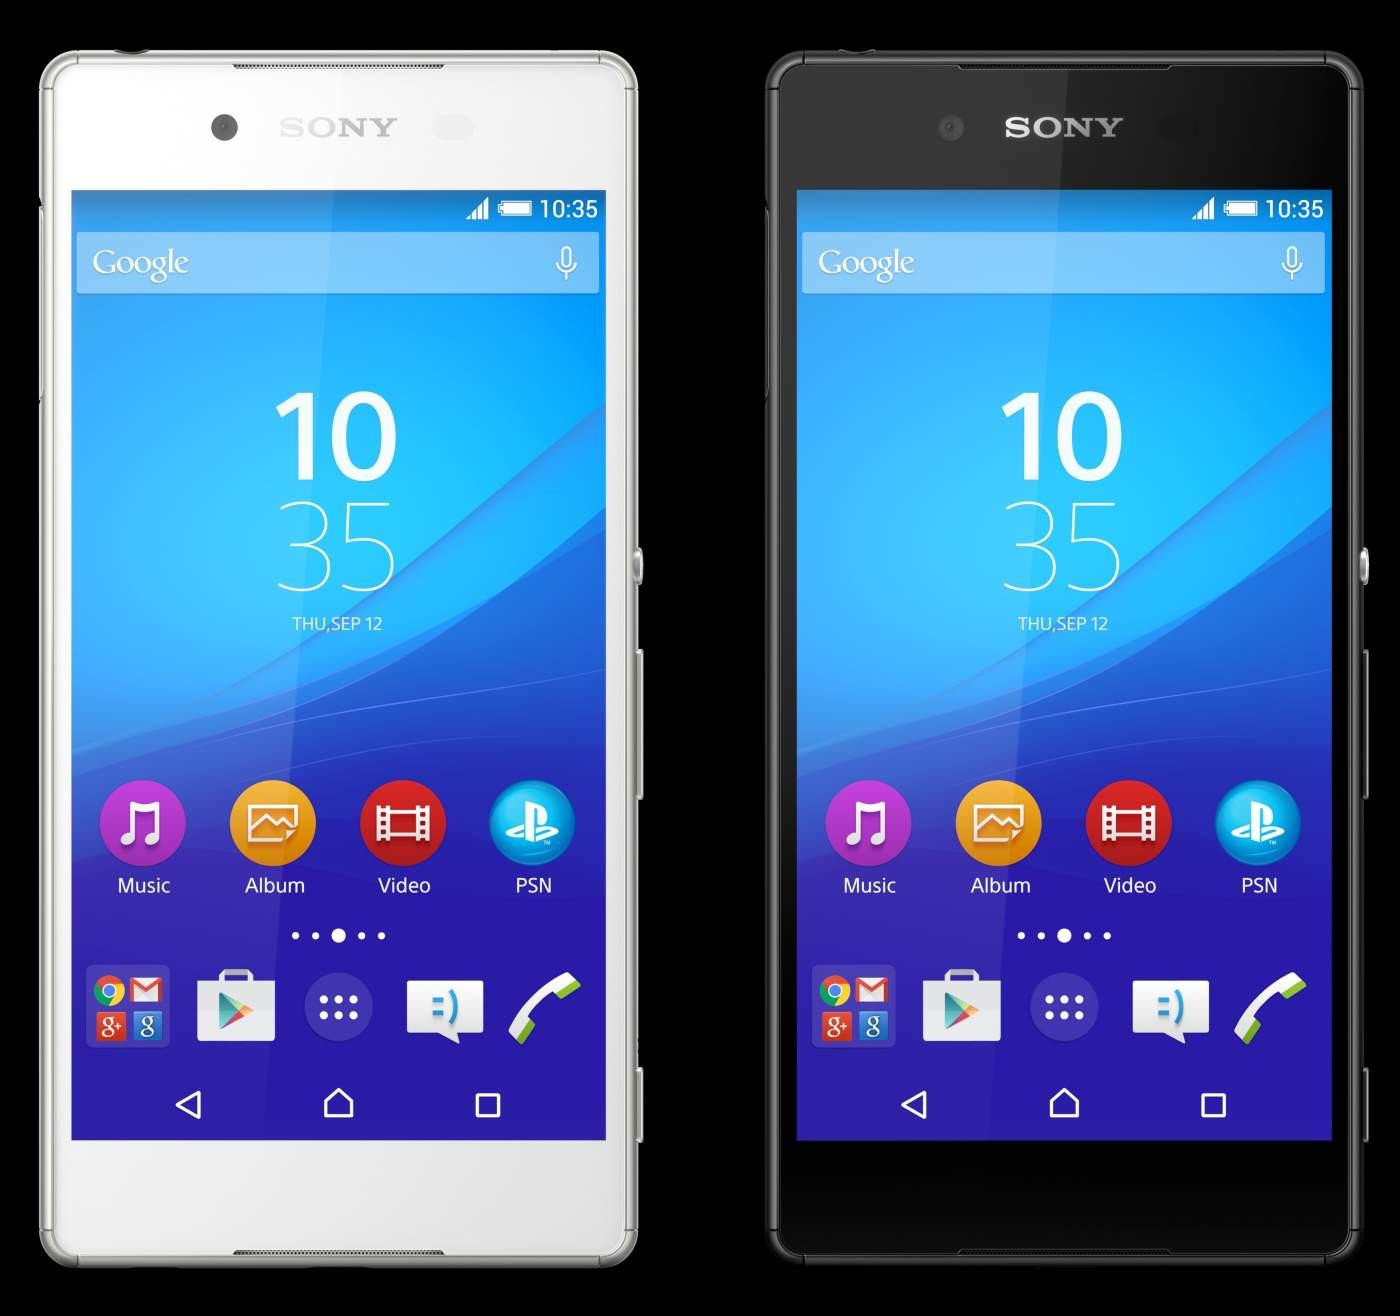 Sony xperia z4 hd image jpg